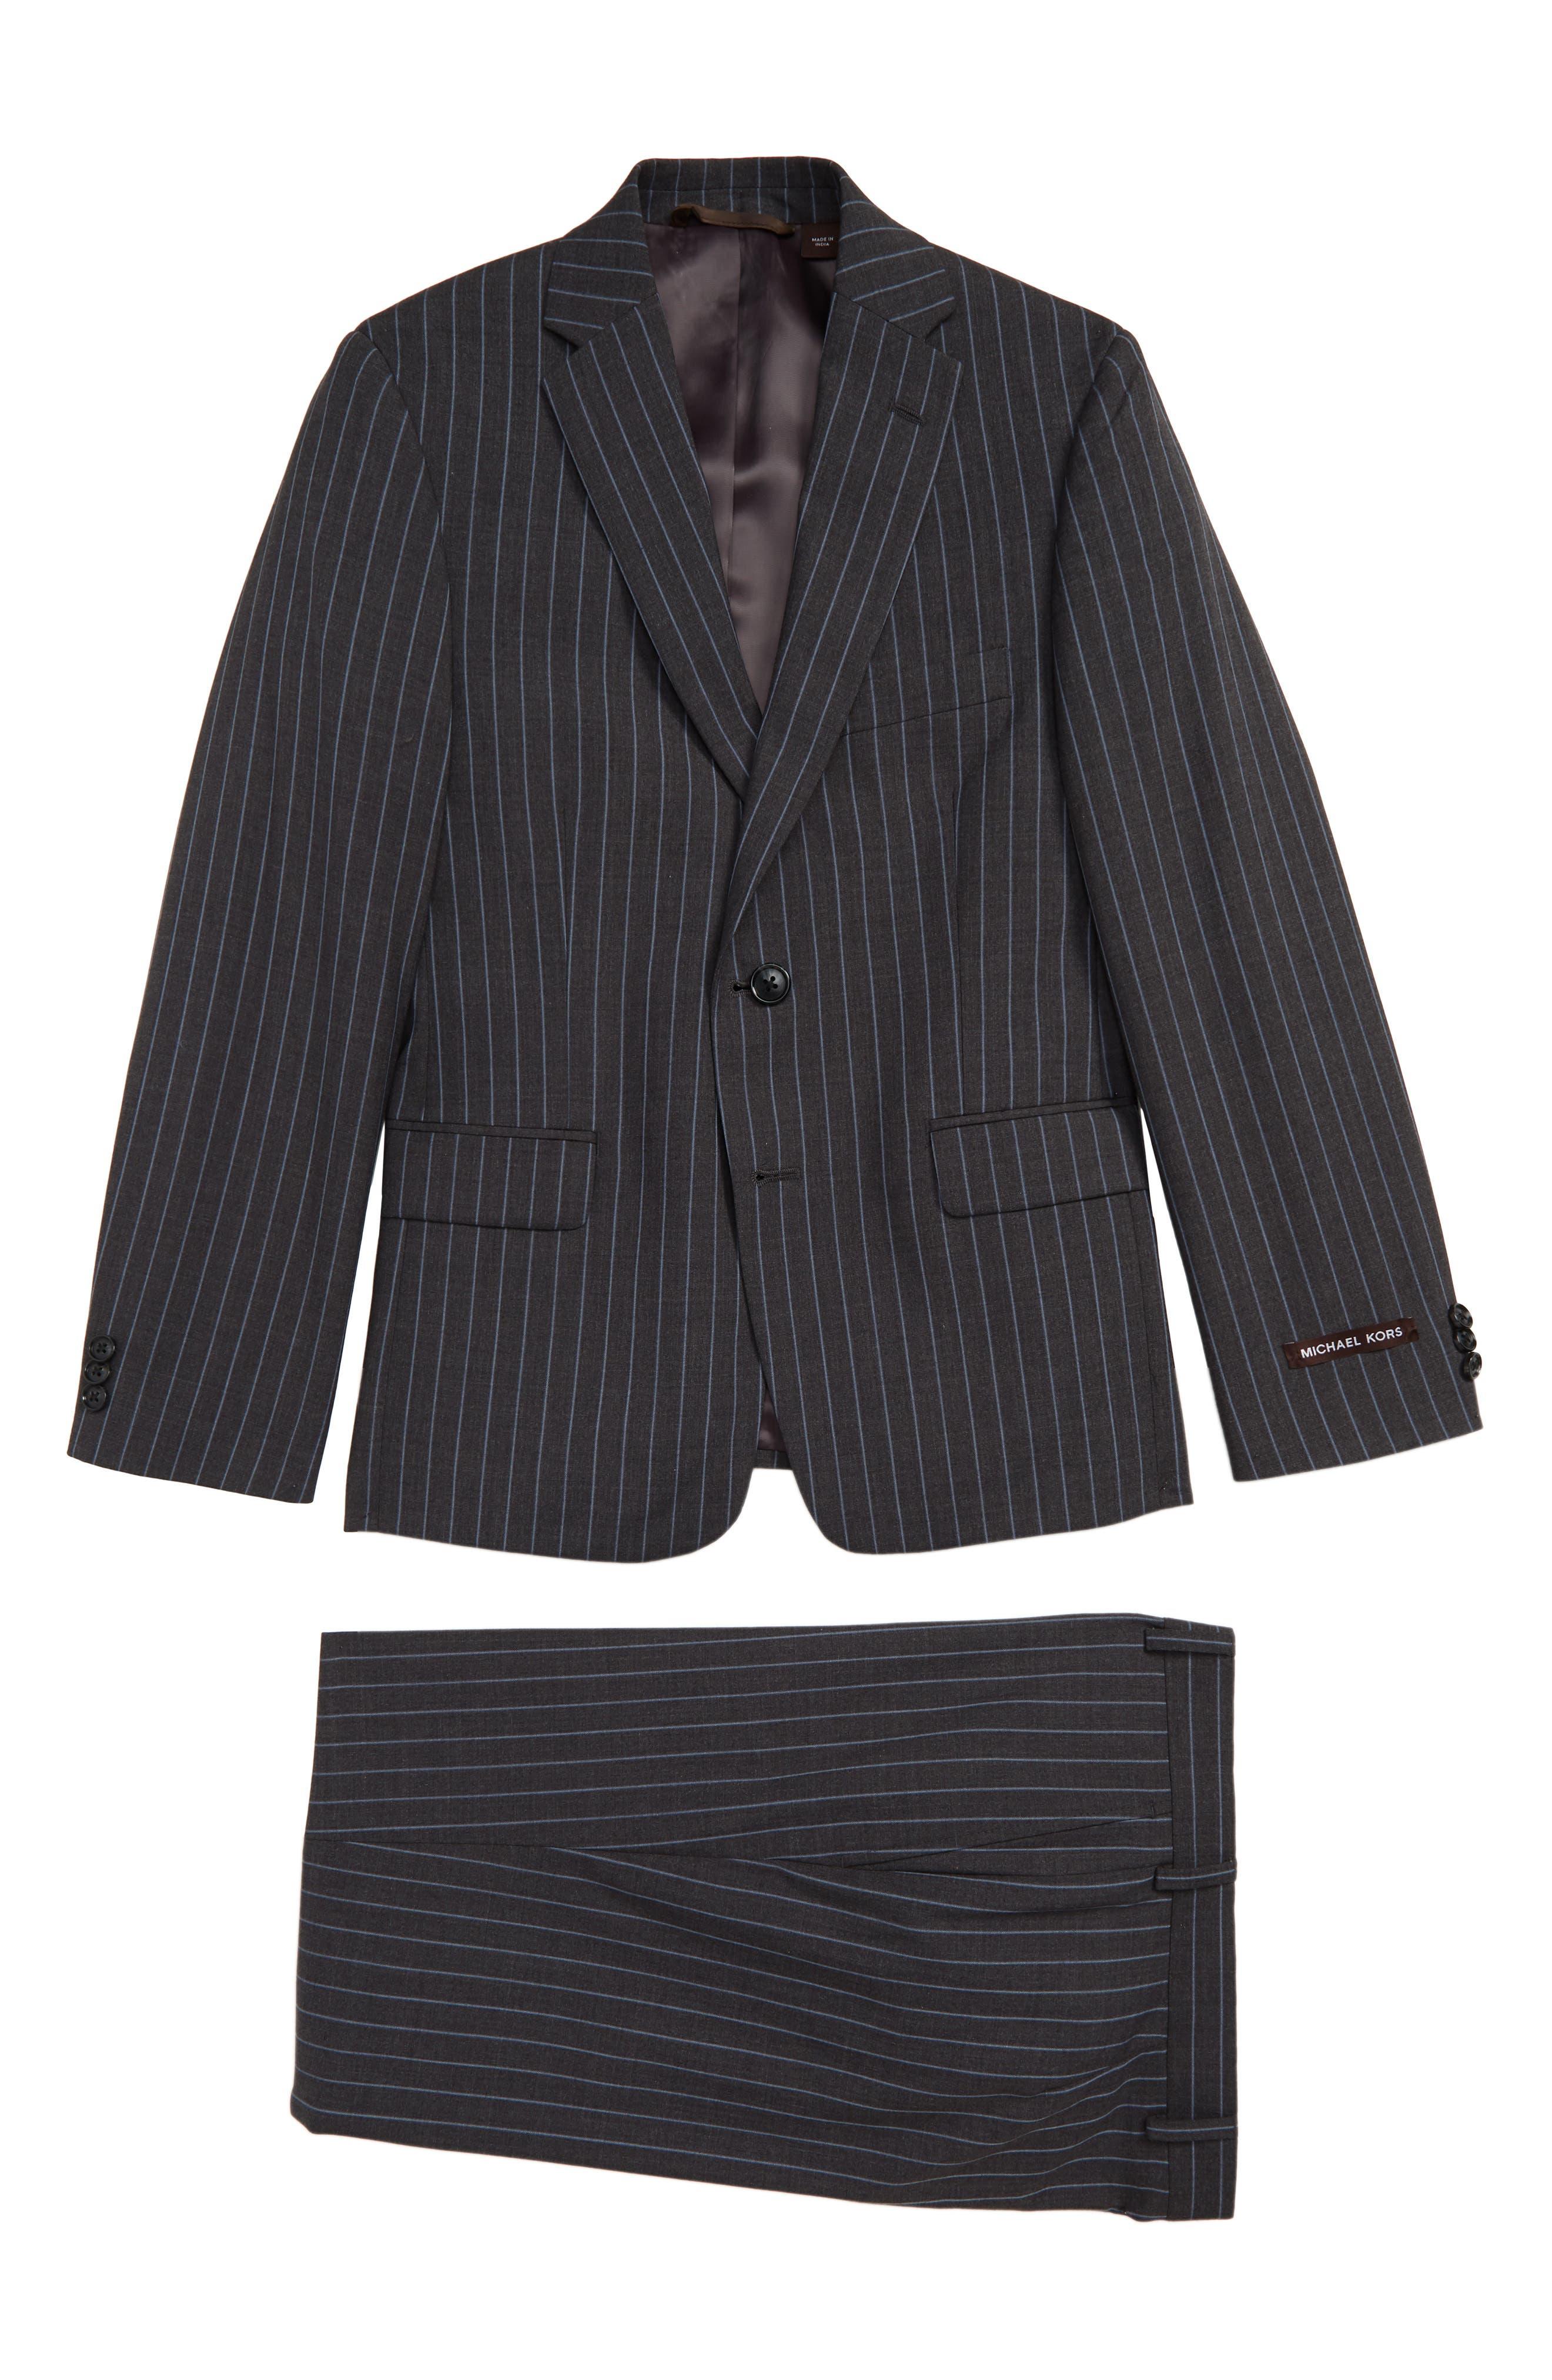 Image of Michael Kors Stripe Wool Blend Suit